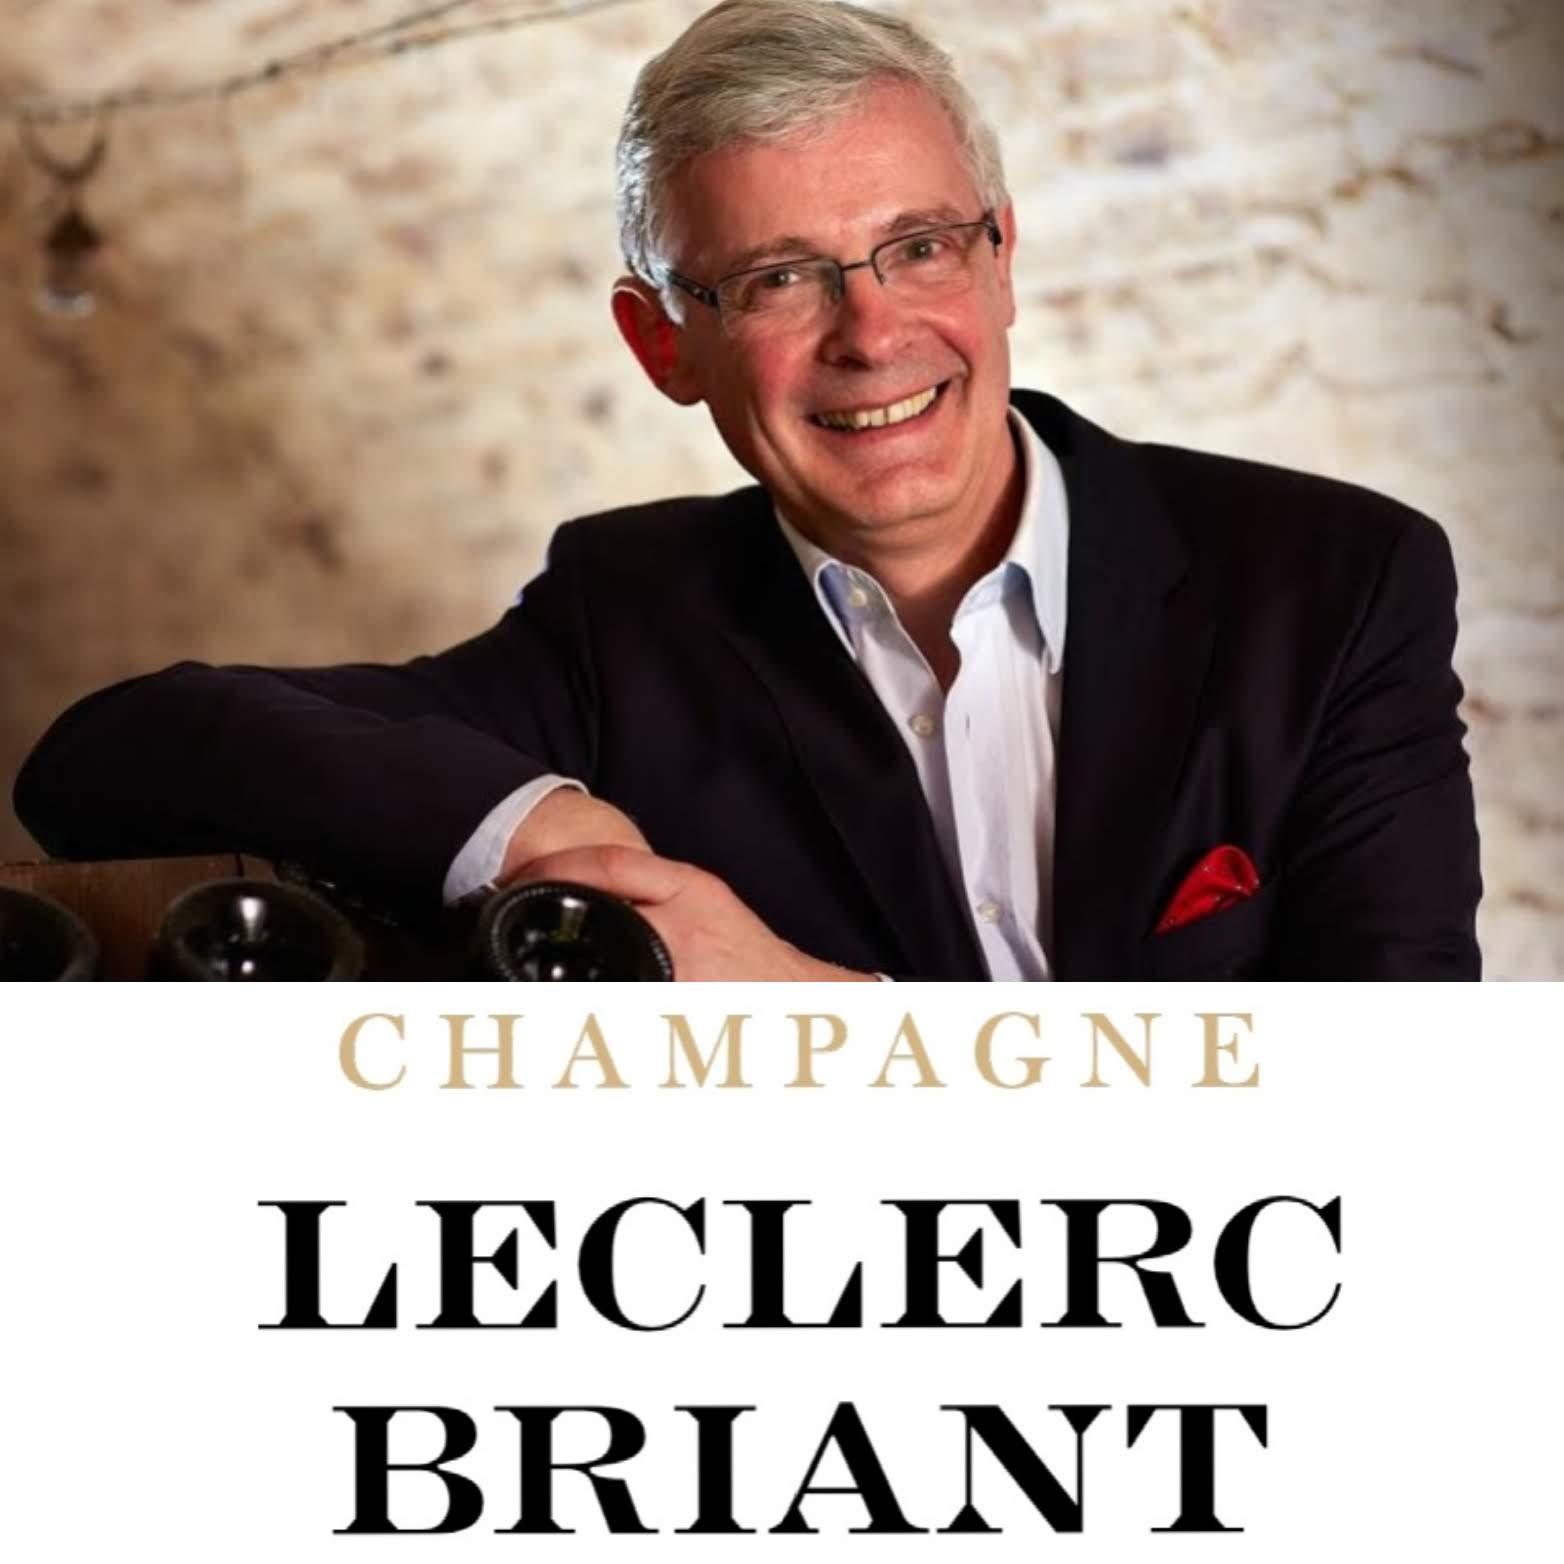 champagne-leclerc-briant